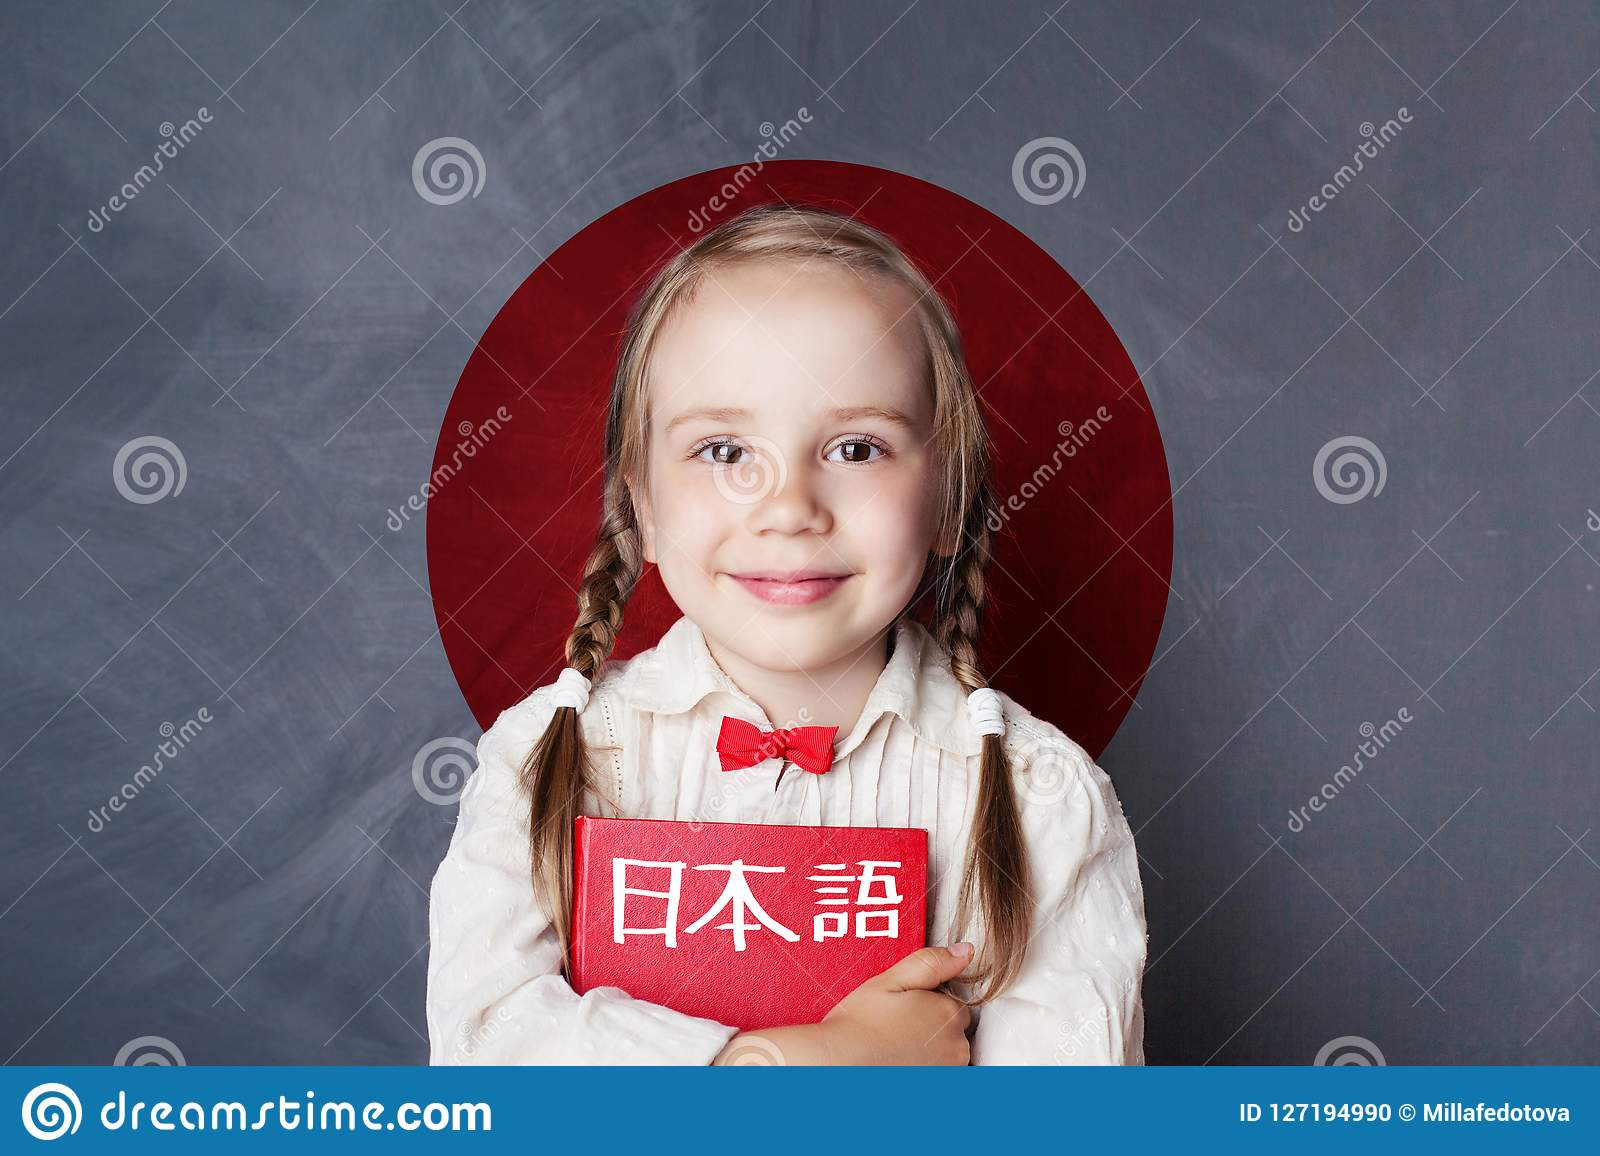 Learn japanese language. Smiling kid pupil on Japan flag